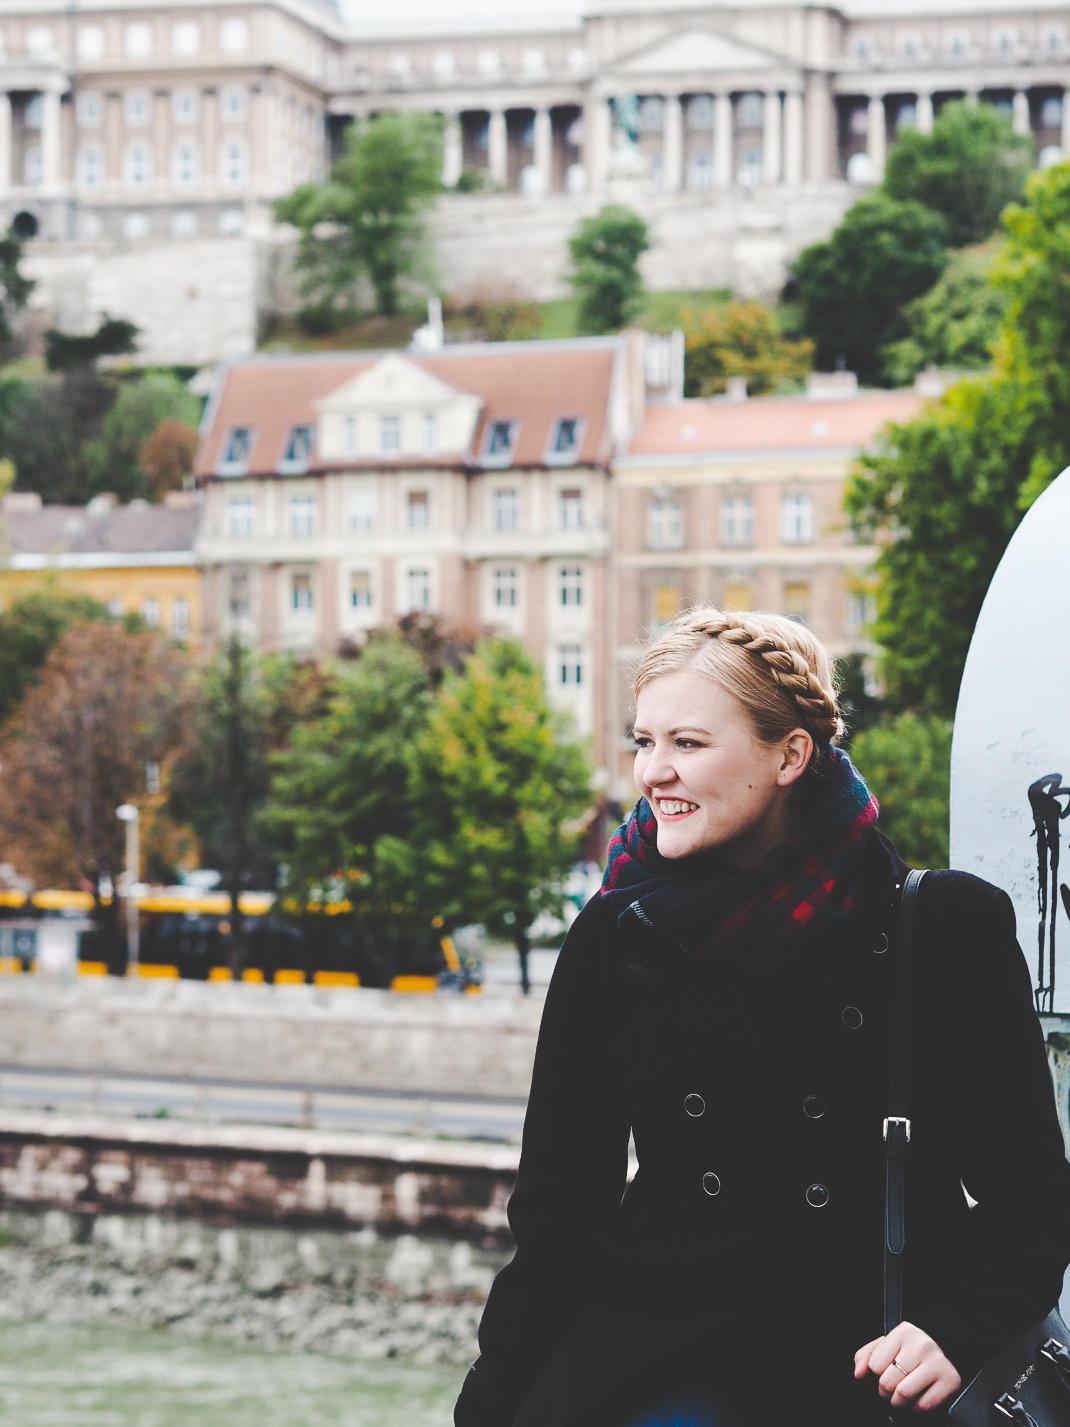 katy in budapest